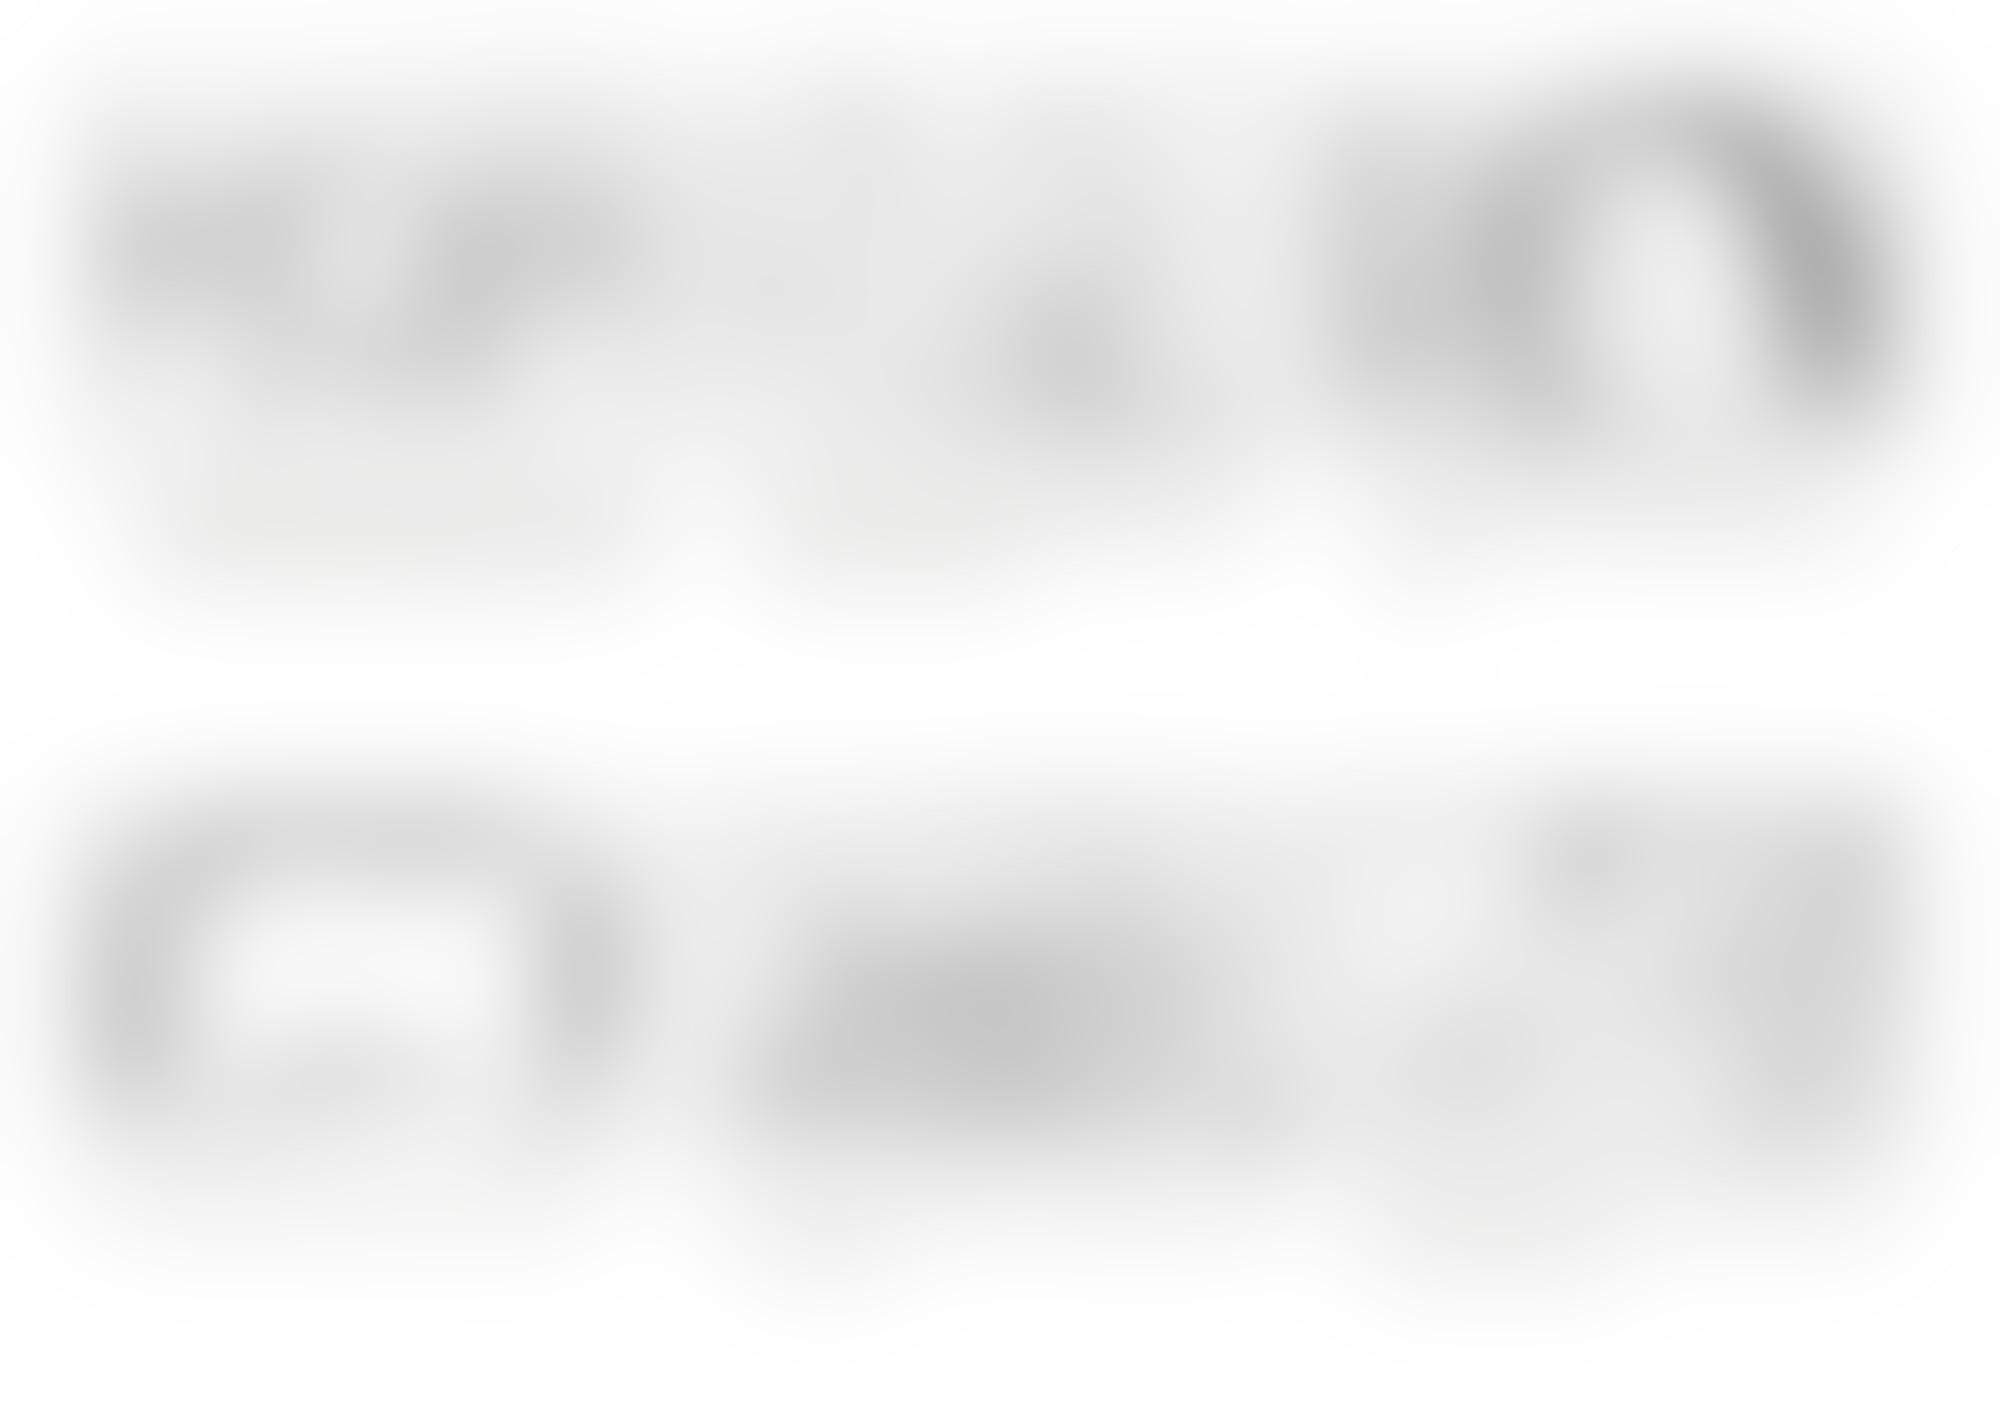 Kiwi Boards4 autocompressfitresizeixlibphp 1 1 0max h2000max w3 D2000q80s6f12d9227108e4fbf041e99ee766d8b4